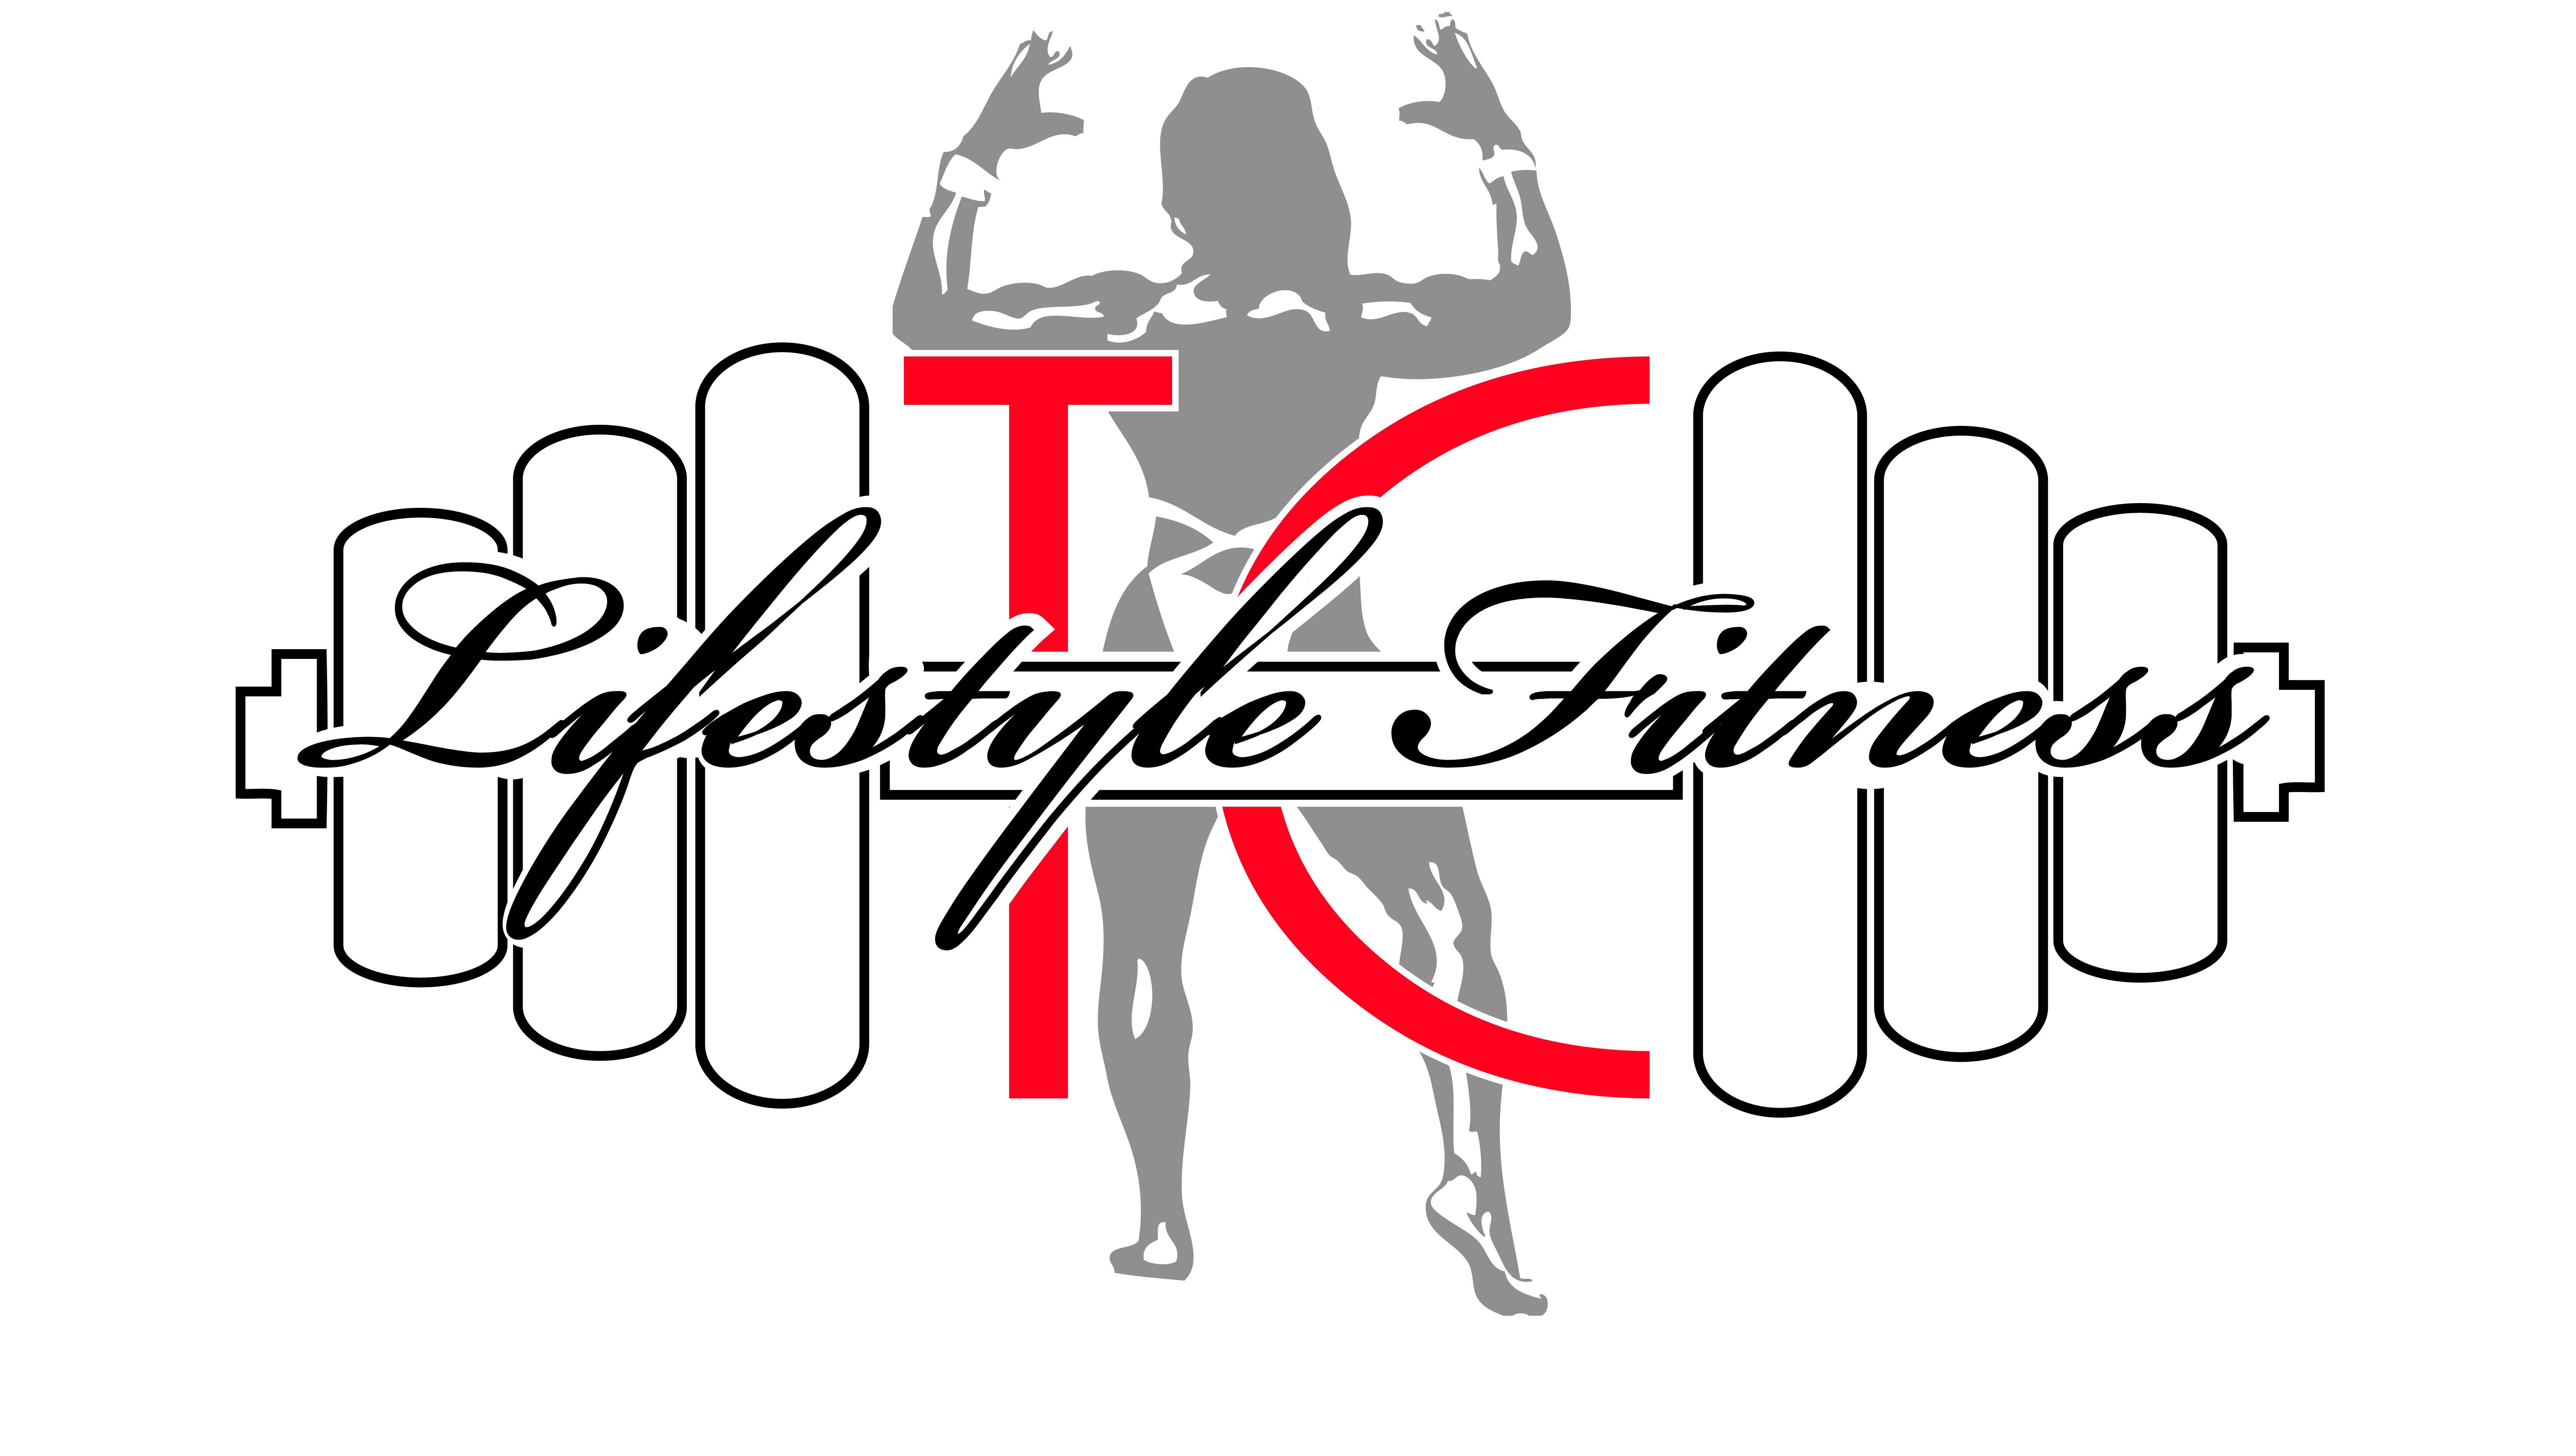 TC_Lifestyle_Fitness_Logo.jpg